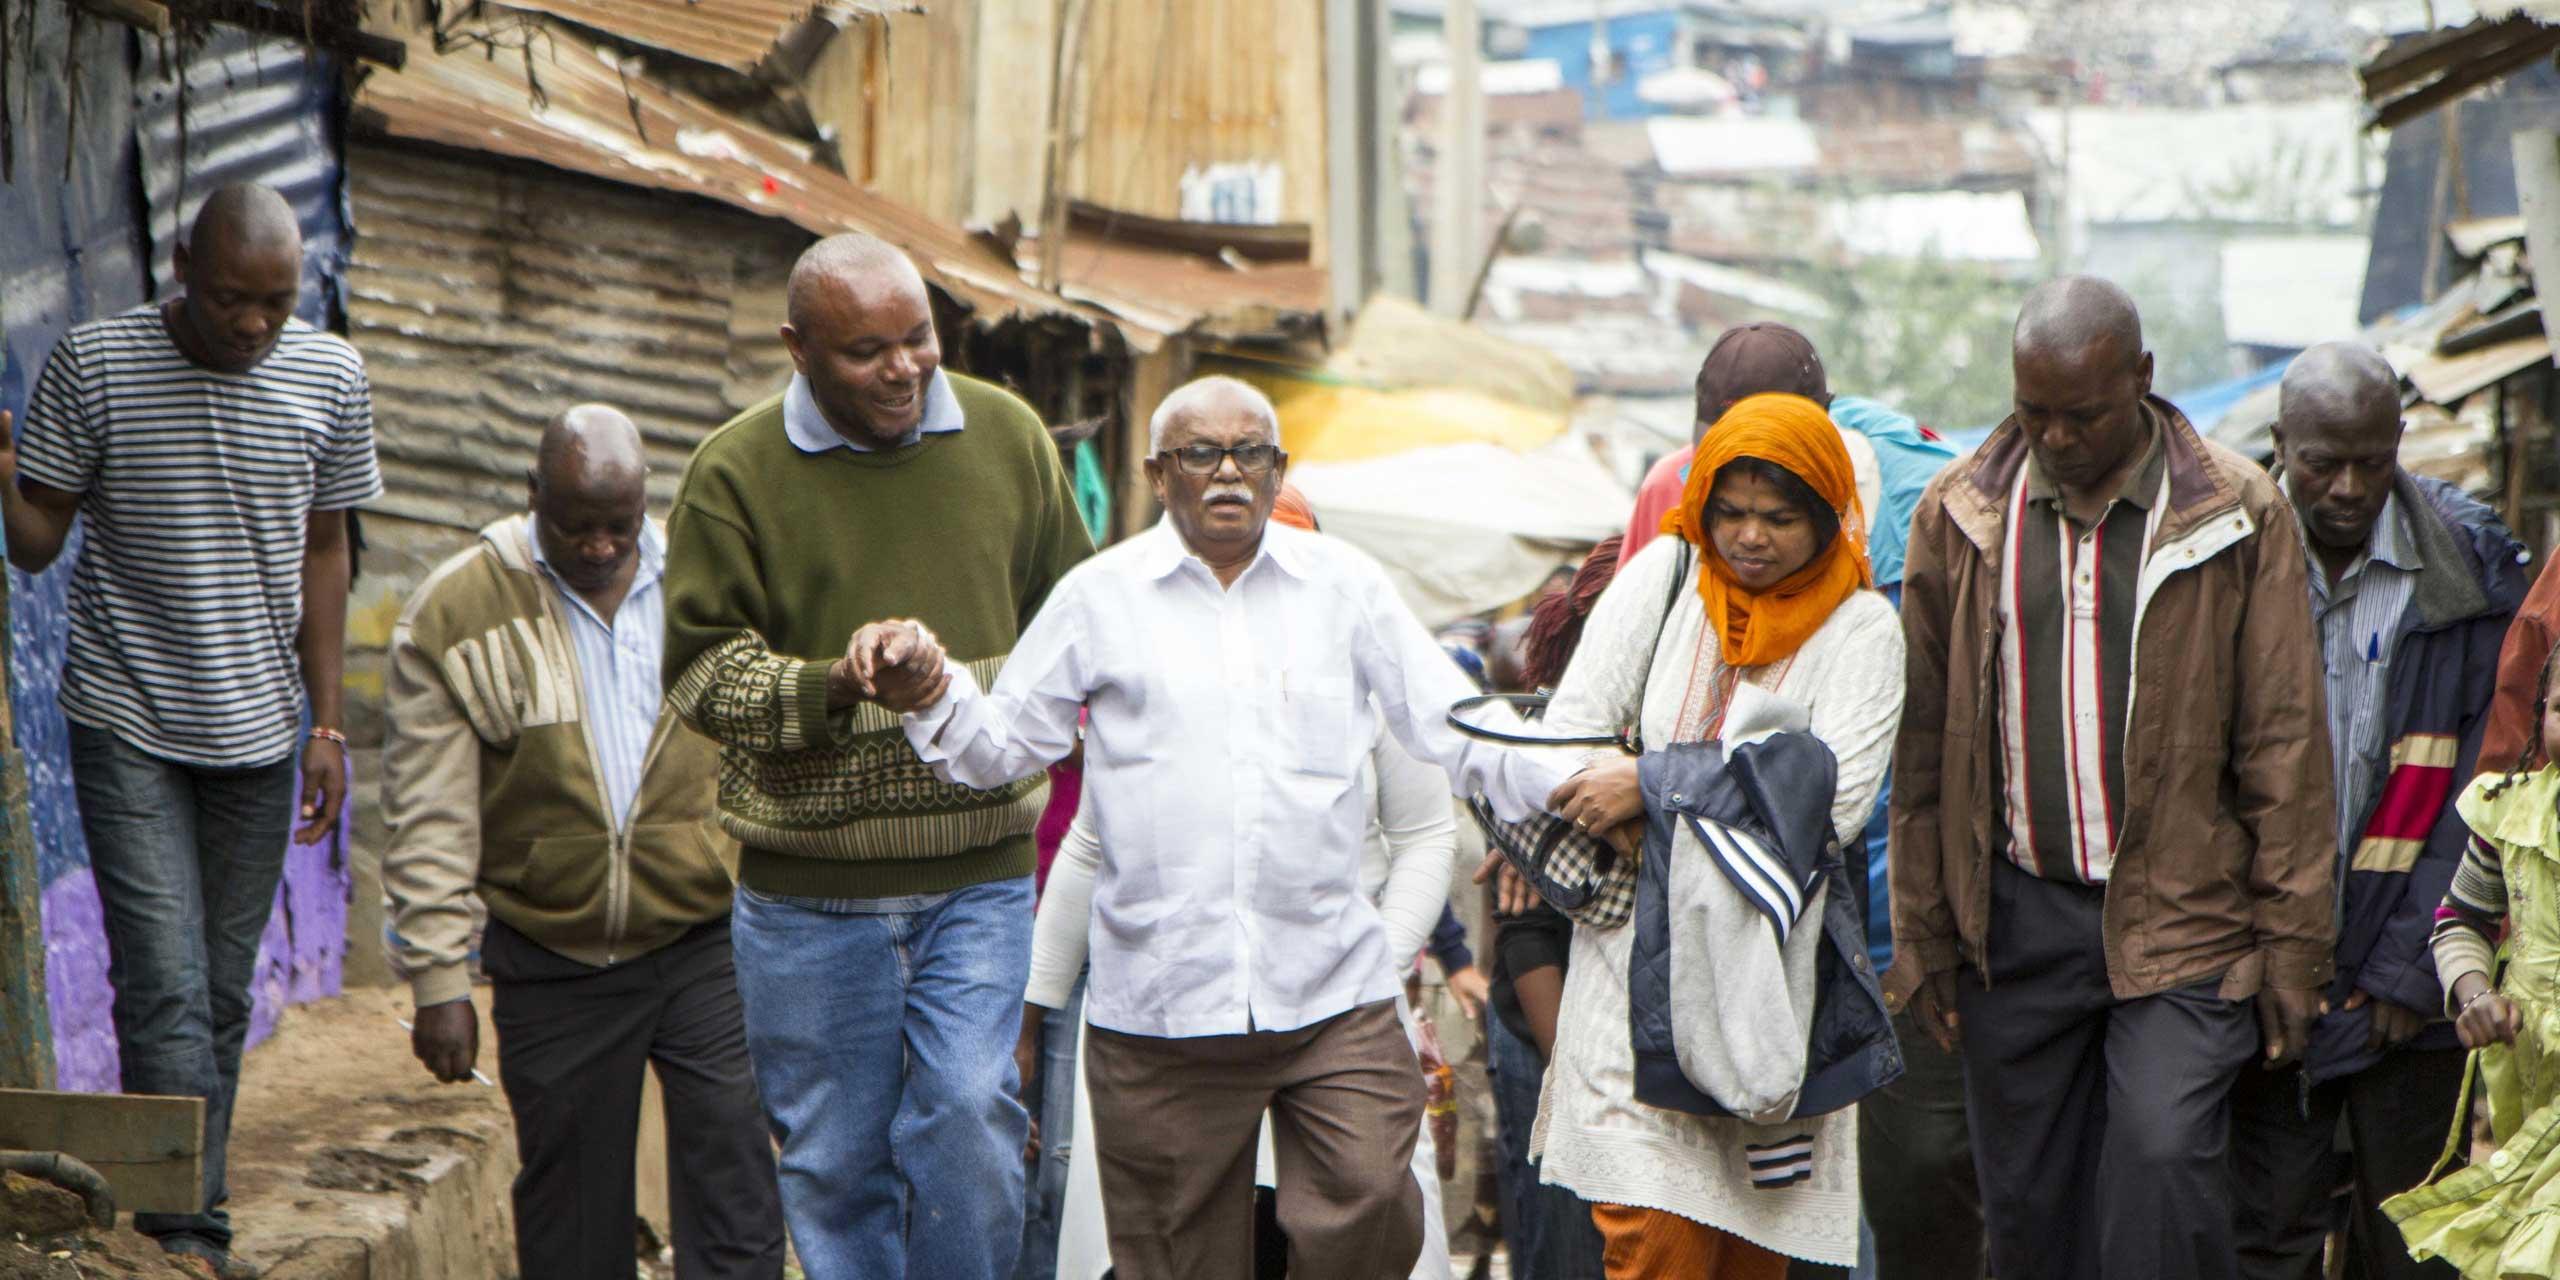 https://s12982.pcdn.co/wp-content/uploads/2015/01/slum-dwellers-international-sl3.jpg